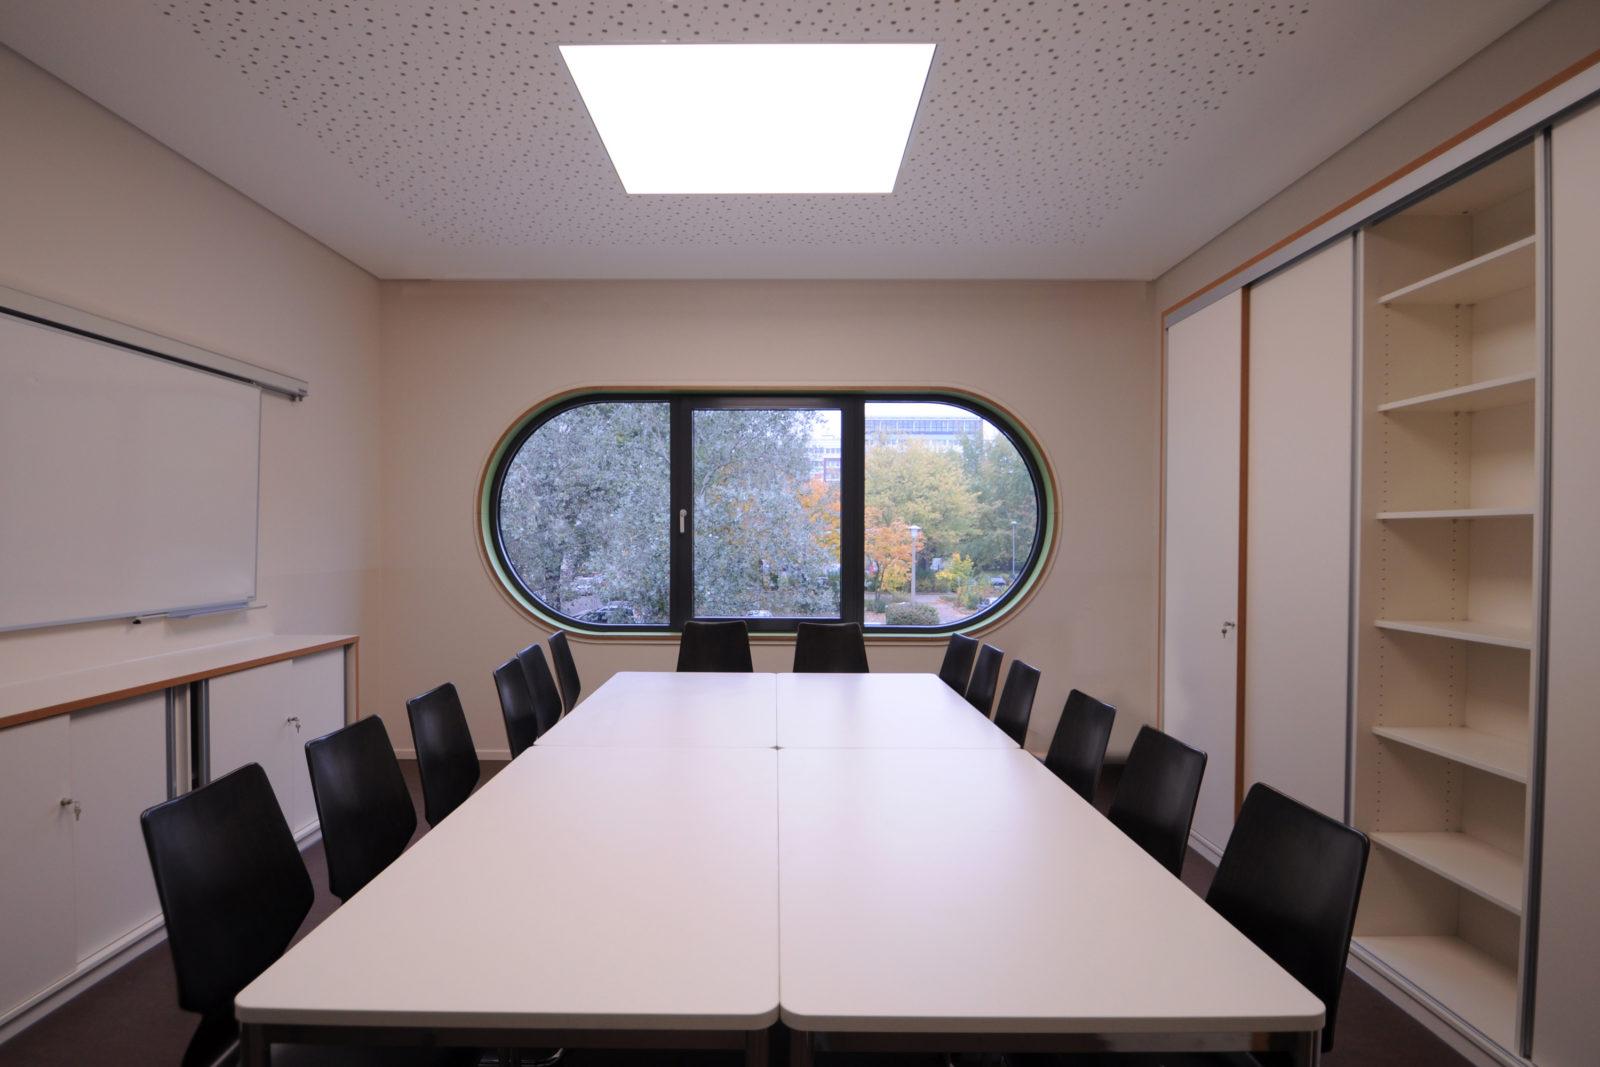 Umbau Werner-Vogel-Schule Leipzig, Lößnig - Lehrerzimmer